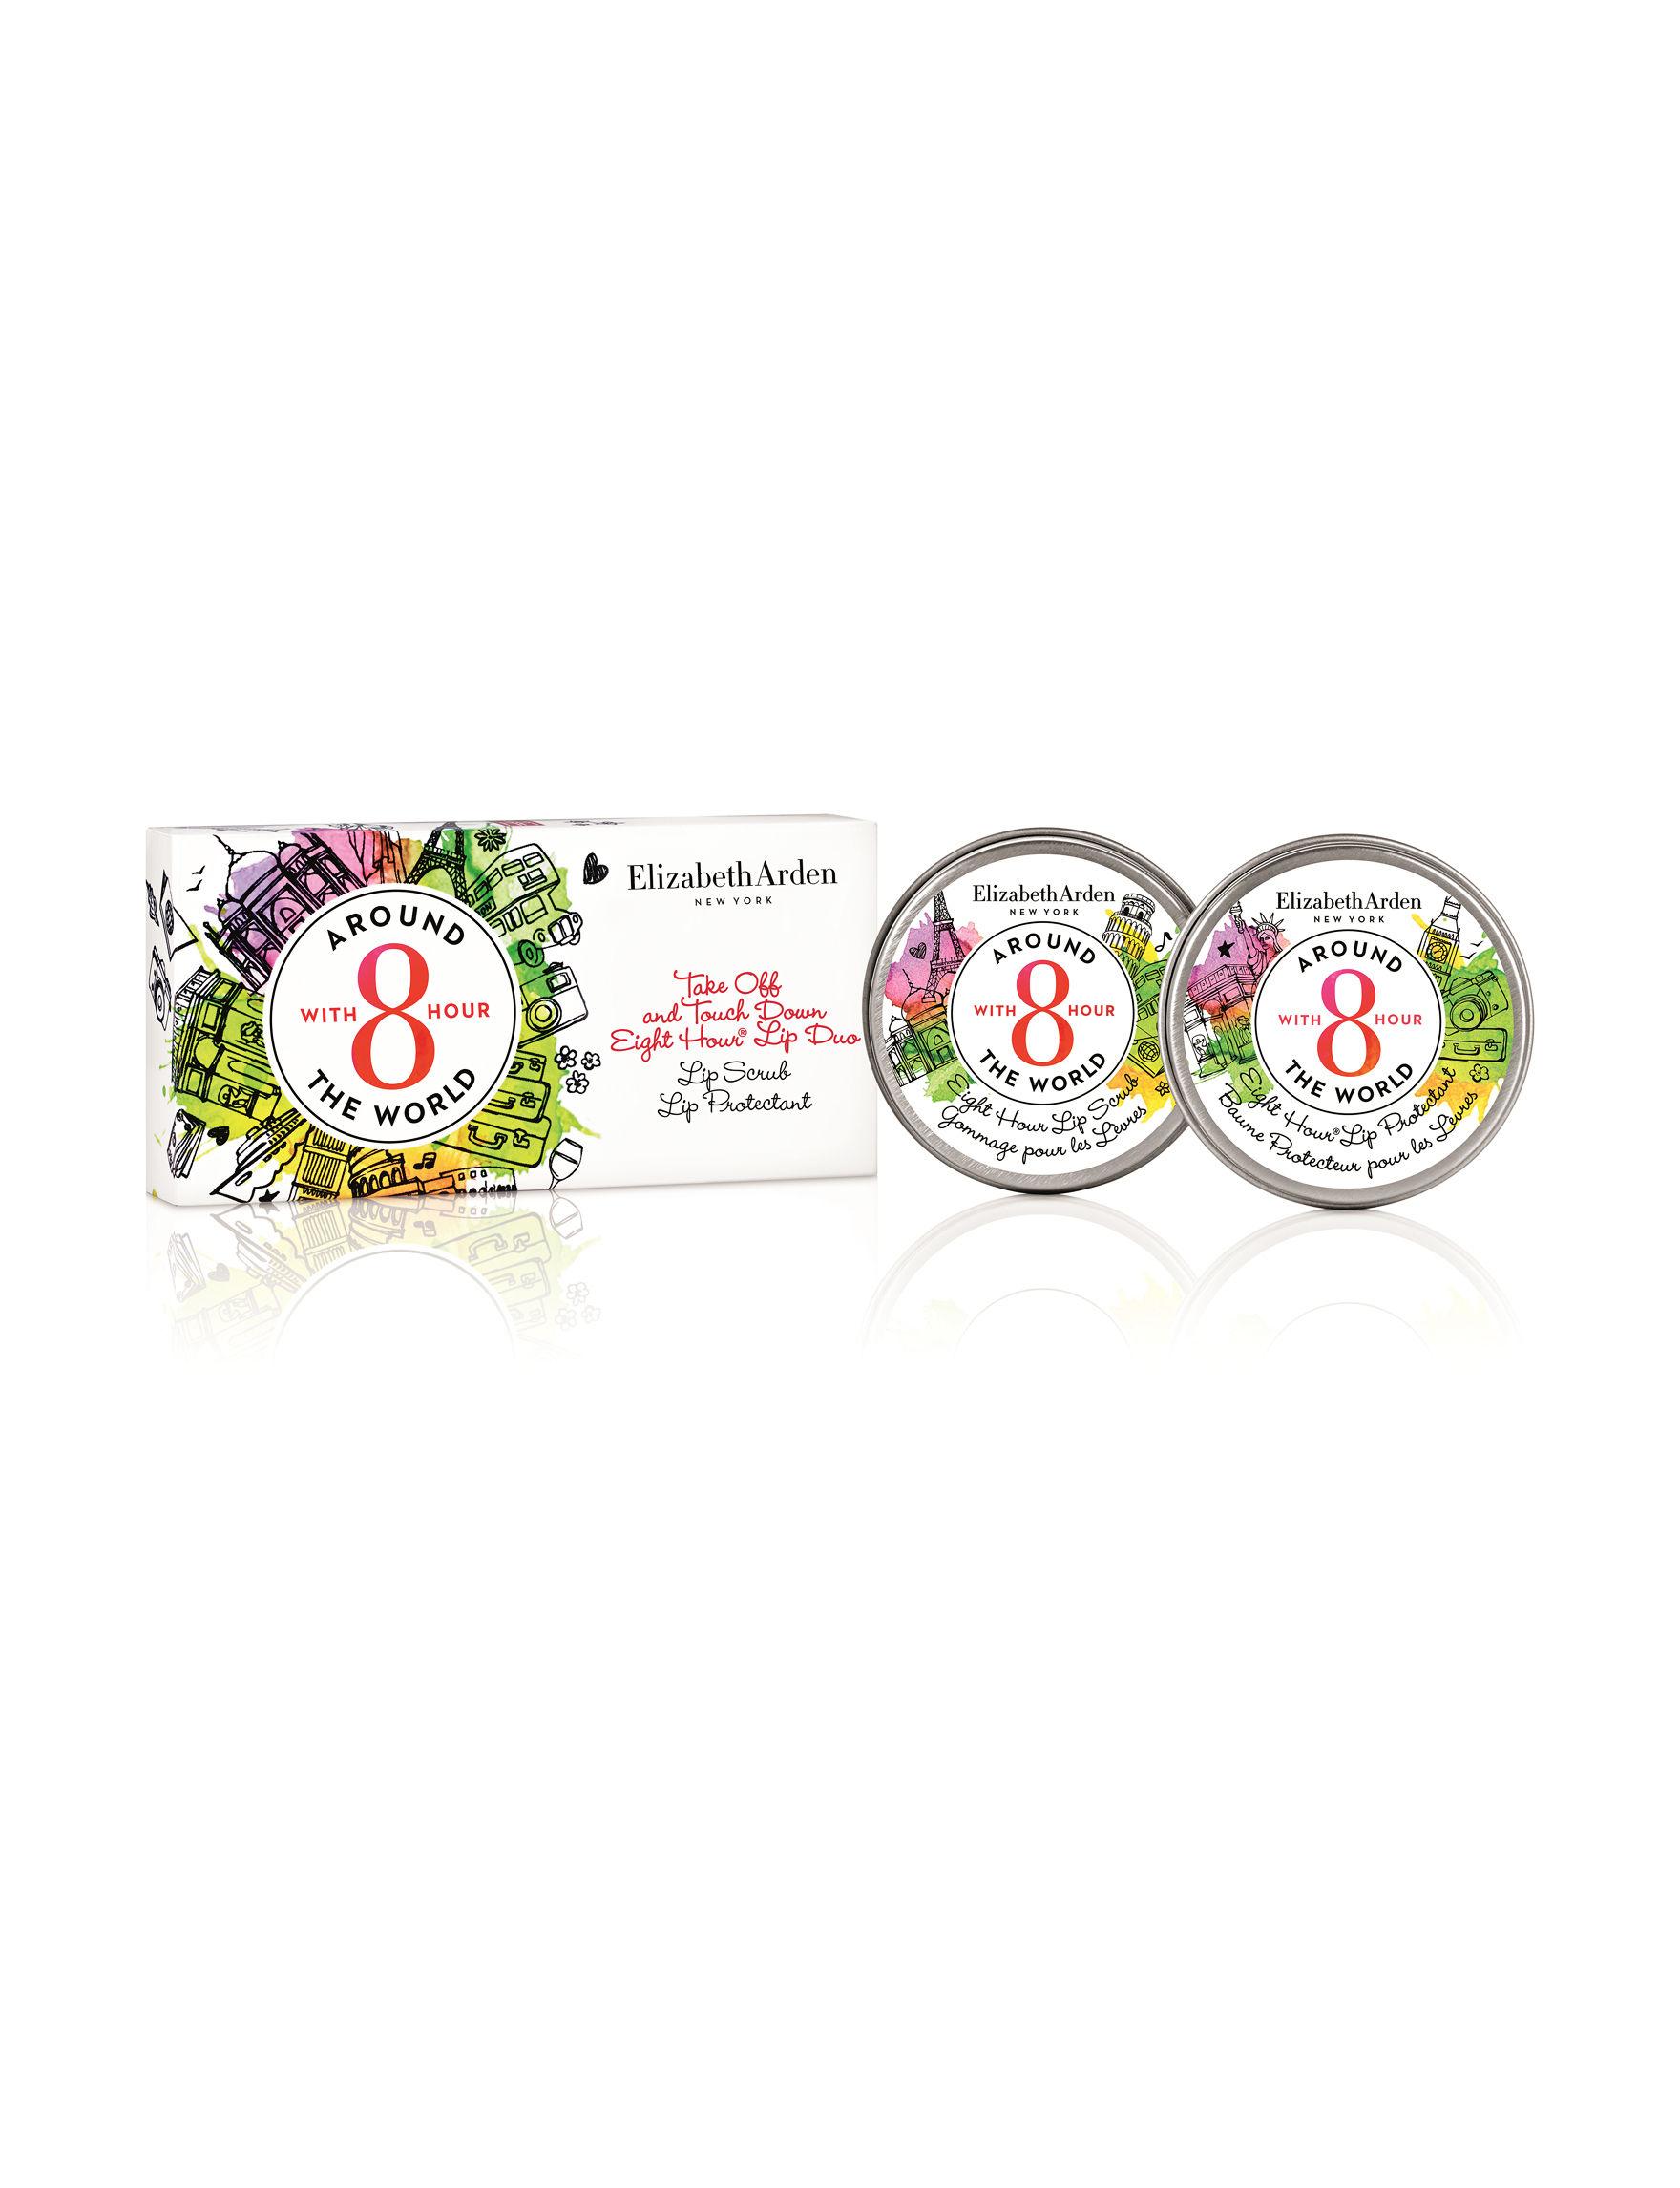 Elizabeth Arden  Moisturizers Skin Care Kits & Sets Lip Balm